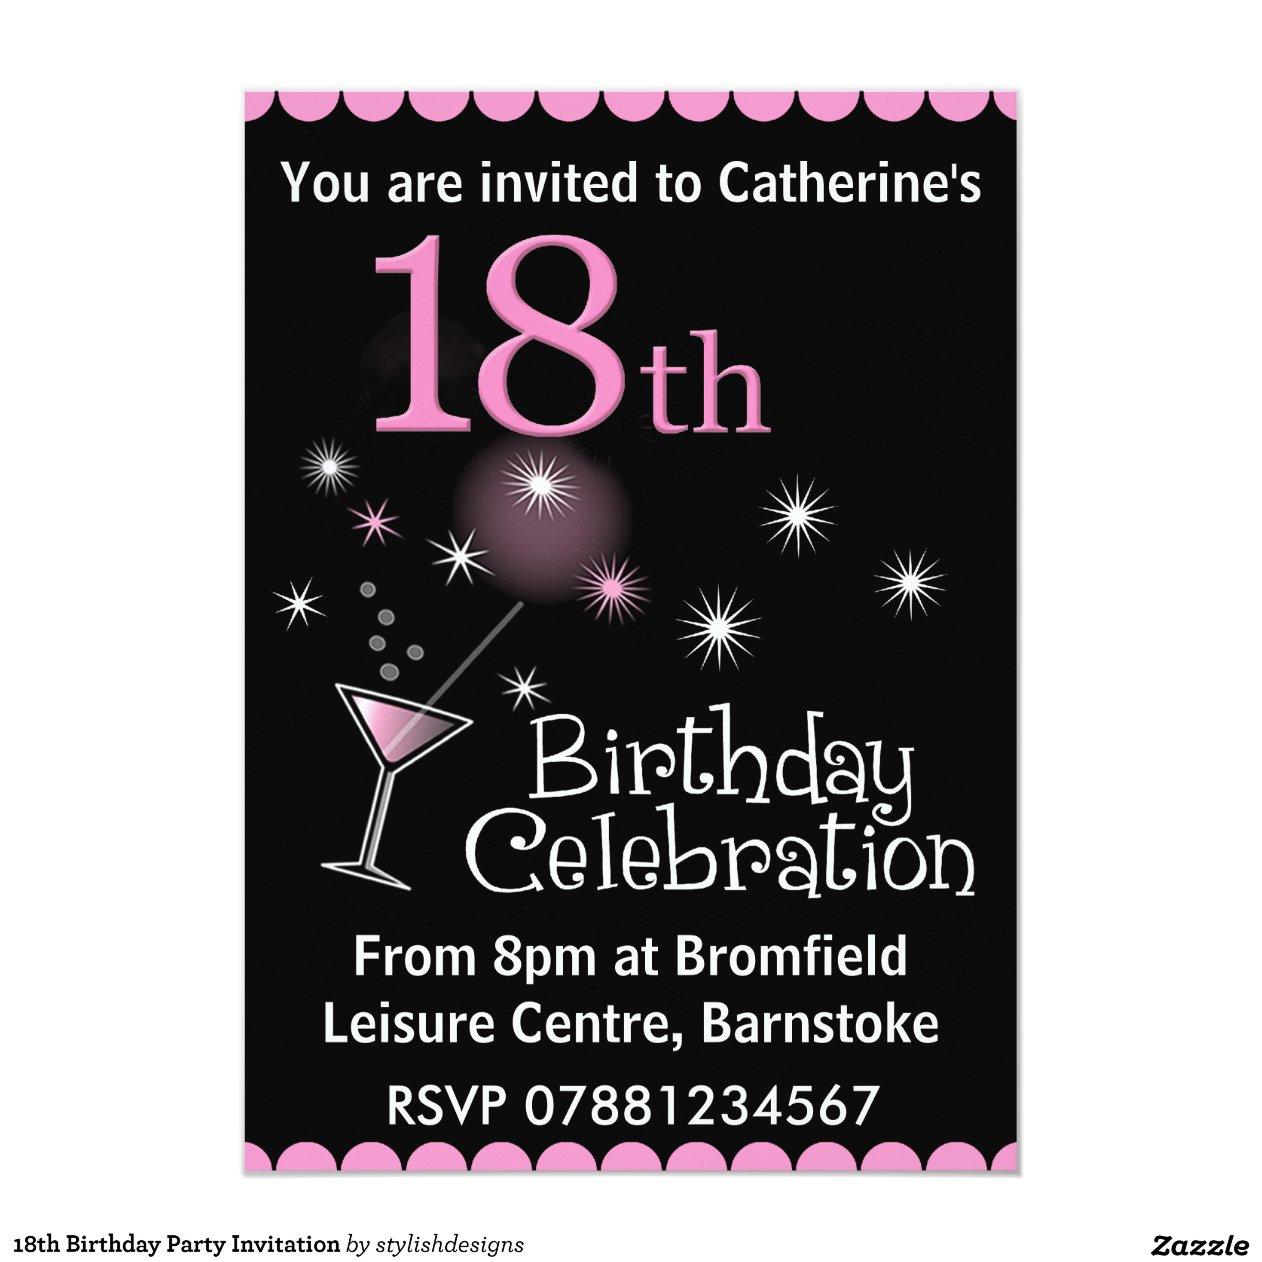 18th Birthday Party Invitation | Zazzle